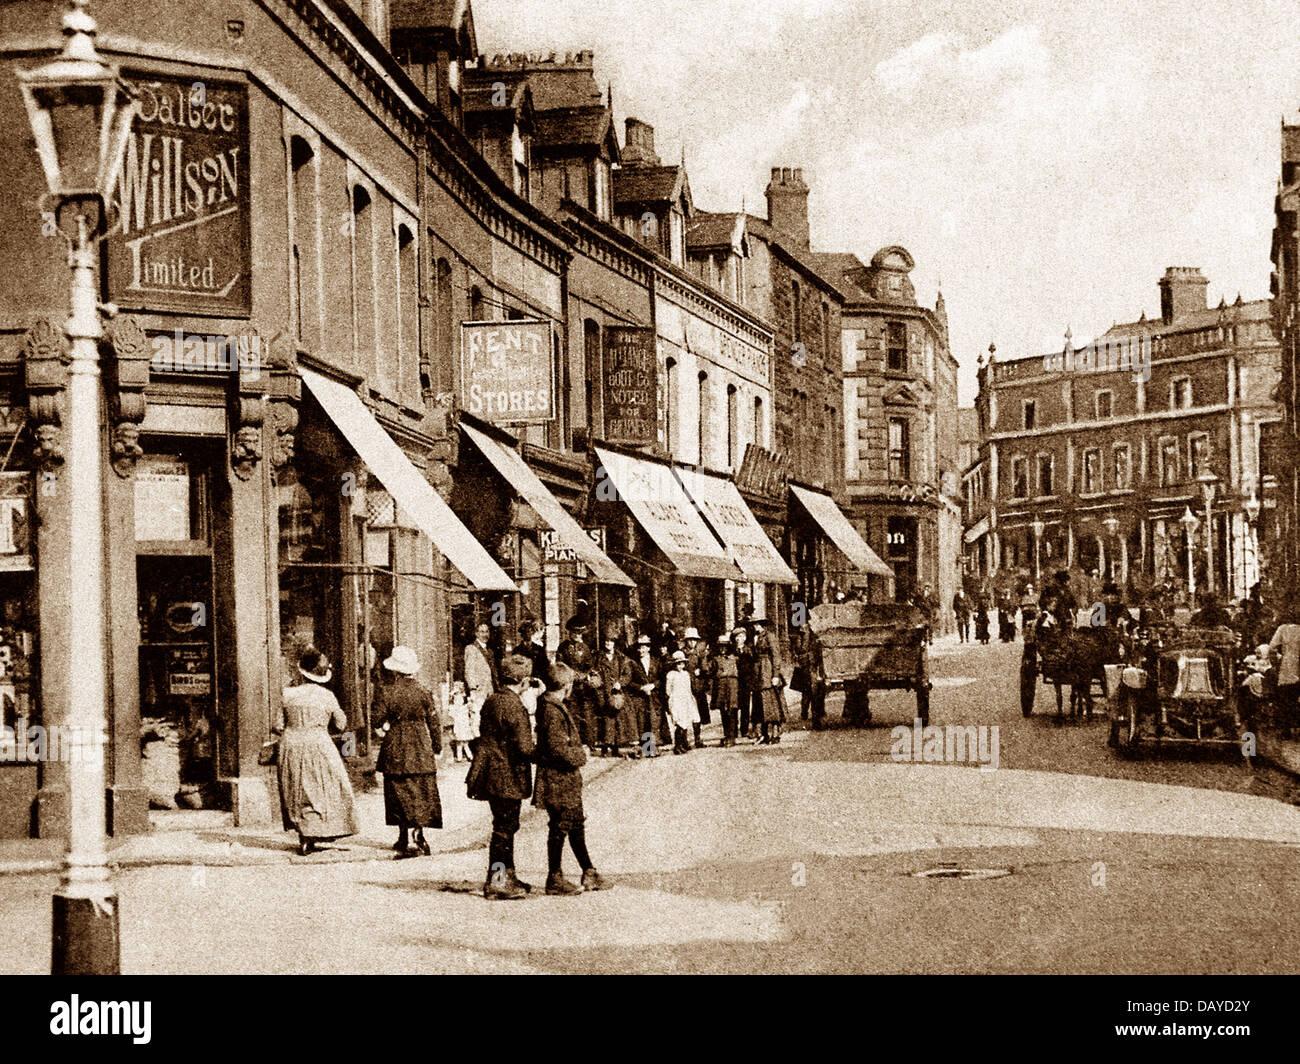 Workington Fisher Street early 1900s - Stock Image